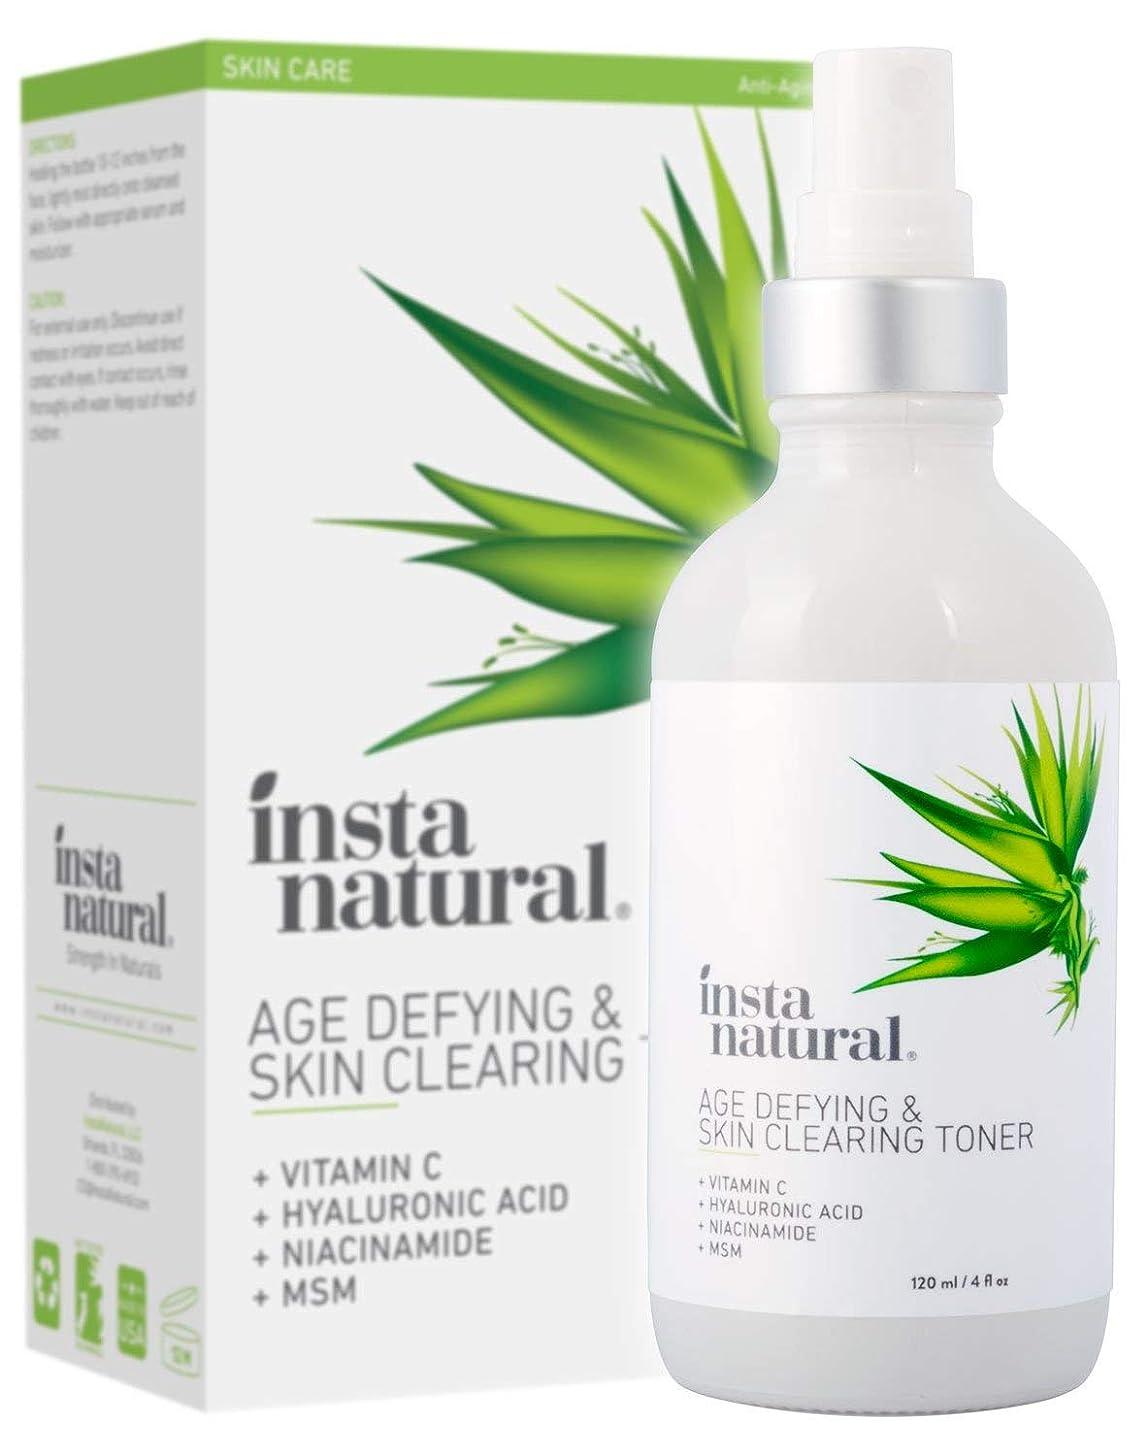 Vitamin C Skin Clearing Face Toner - Natural & Organic Anti Aging Formula with Salicylic Acid & Hyaluronic Acid - Helps Wrinkle, Dark Spot, Fine Lines - Safe for Sensitive Skin - InstaNatural - 4 oz